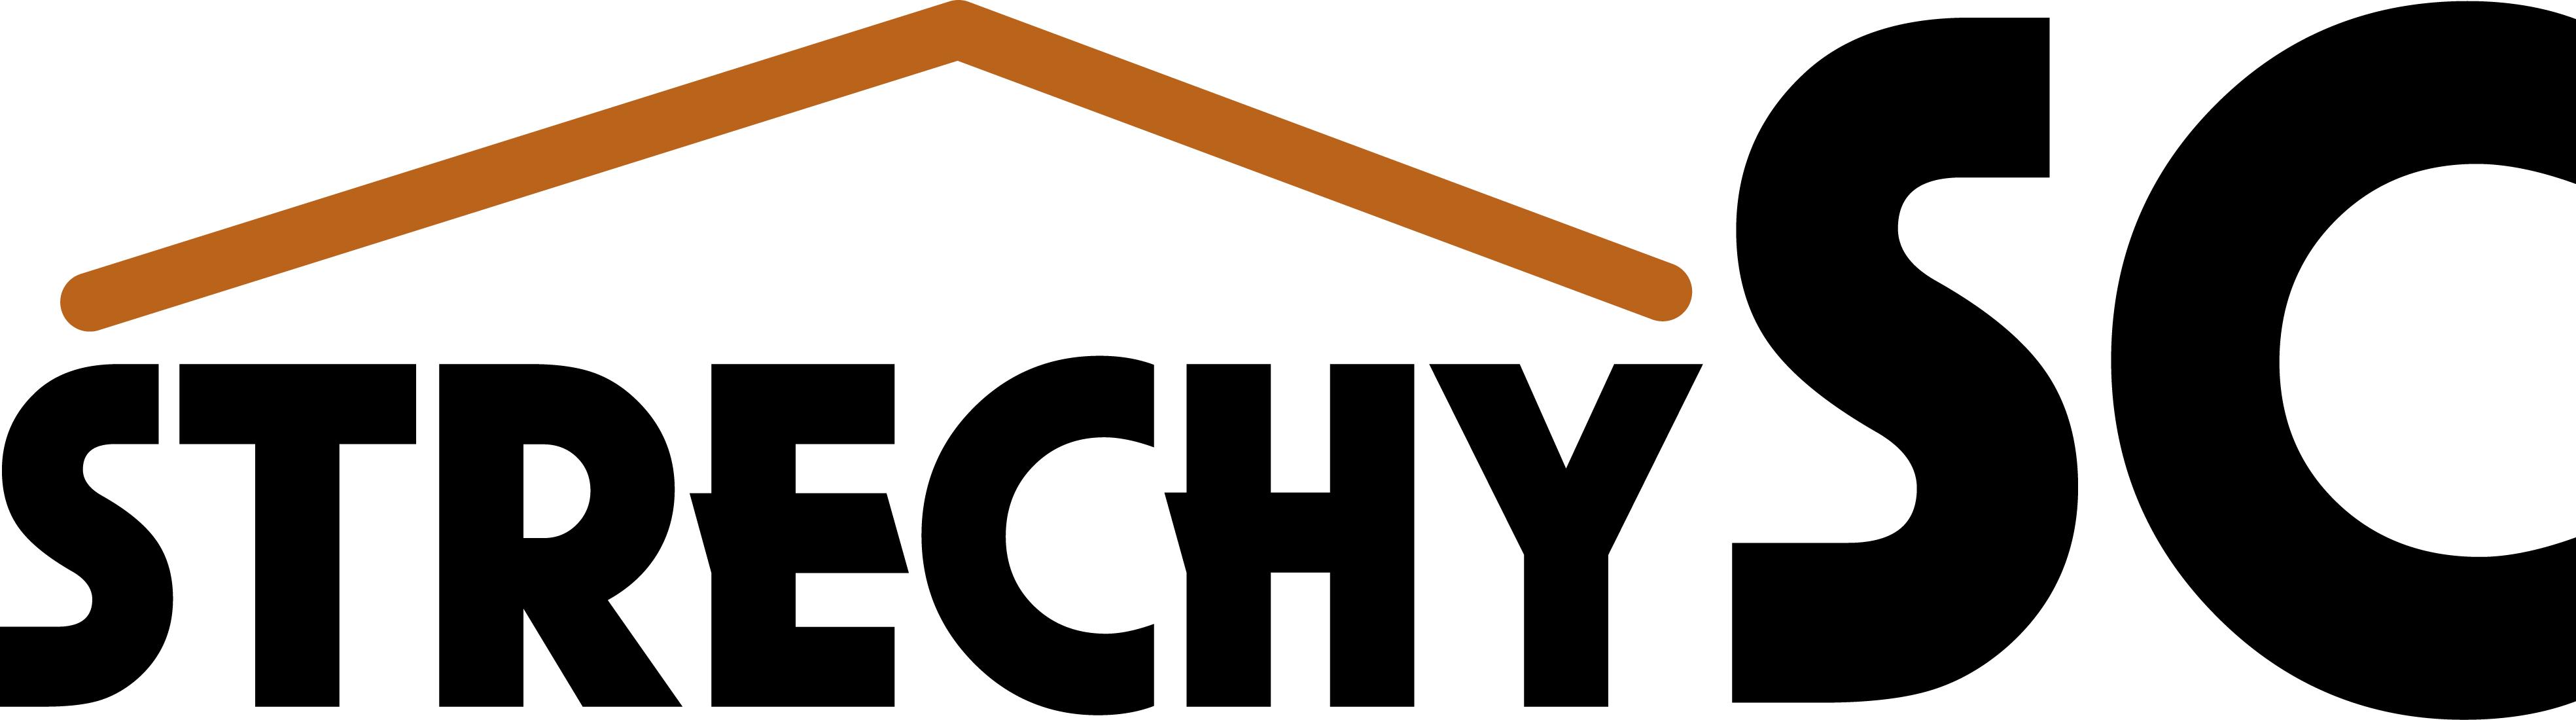 E-shop StrechySC